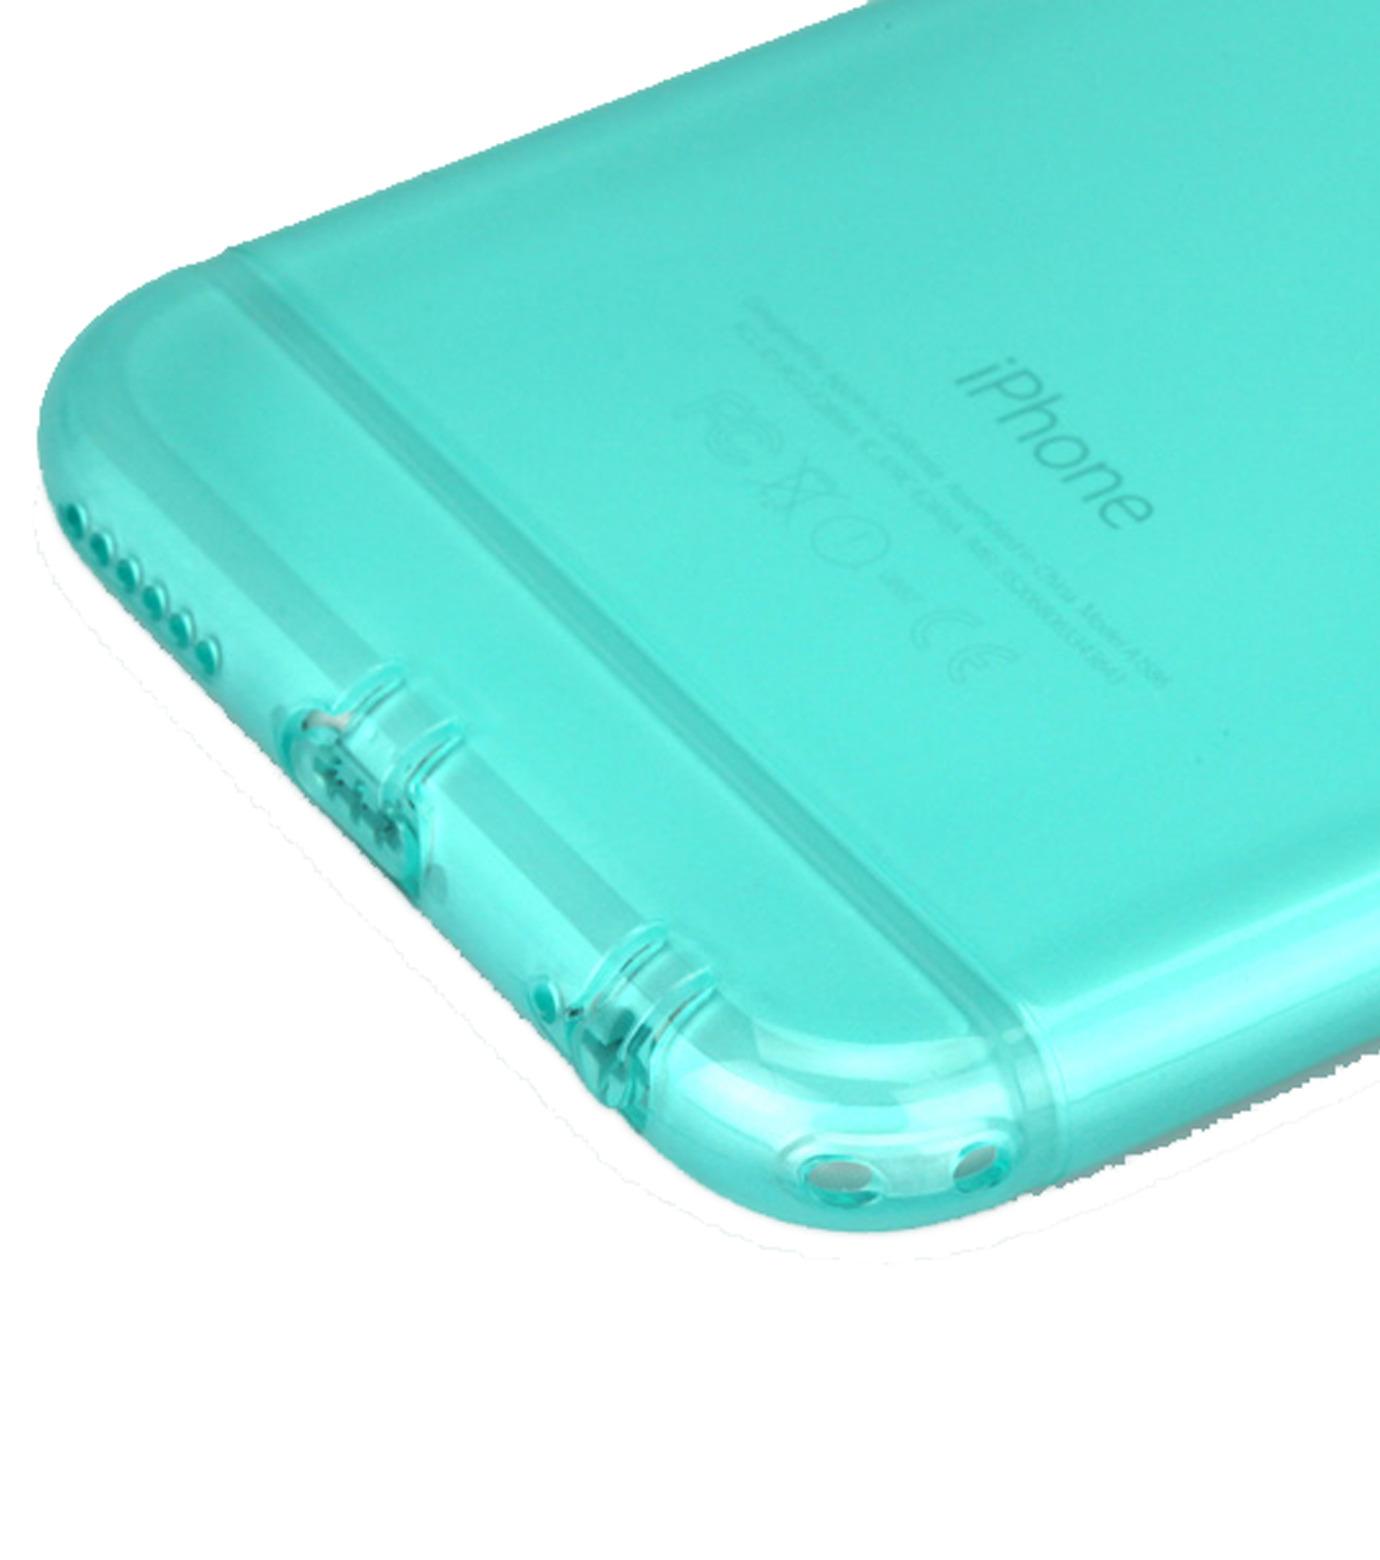 Tunewear(チューンウエア)のsoftshell 6/6s-CHARCHOL GRAY(ケースiphone6/6s/case iphone6/6s)-TUN-PH-0399-12 拡大詳細画像4